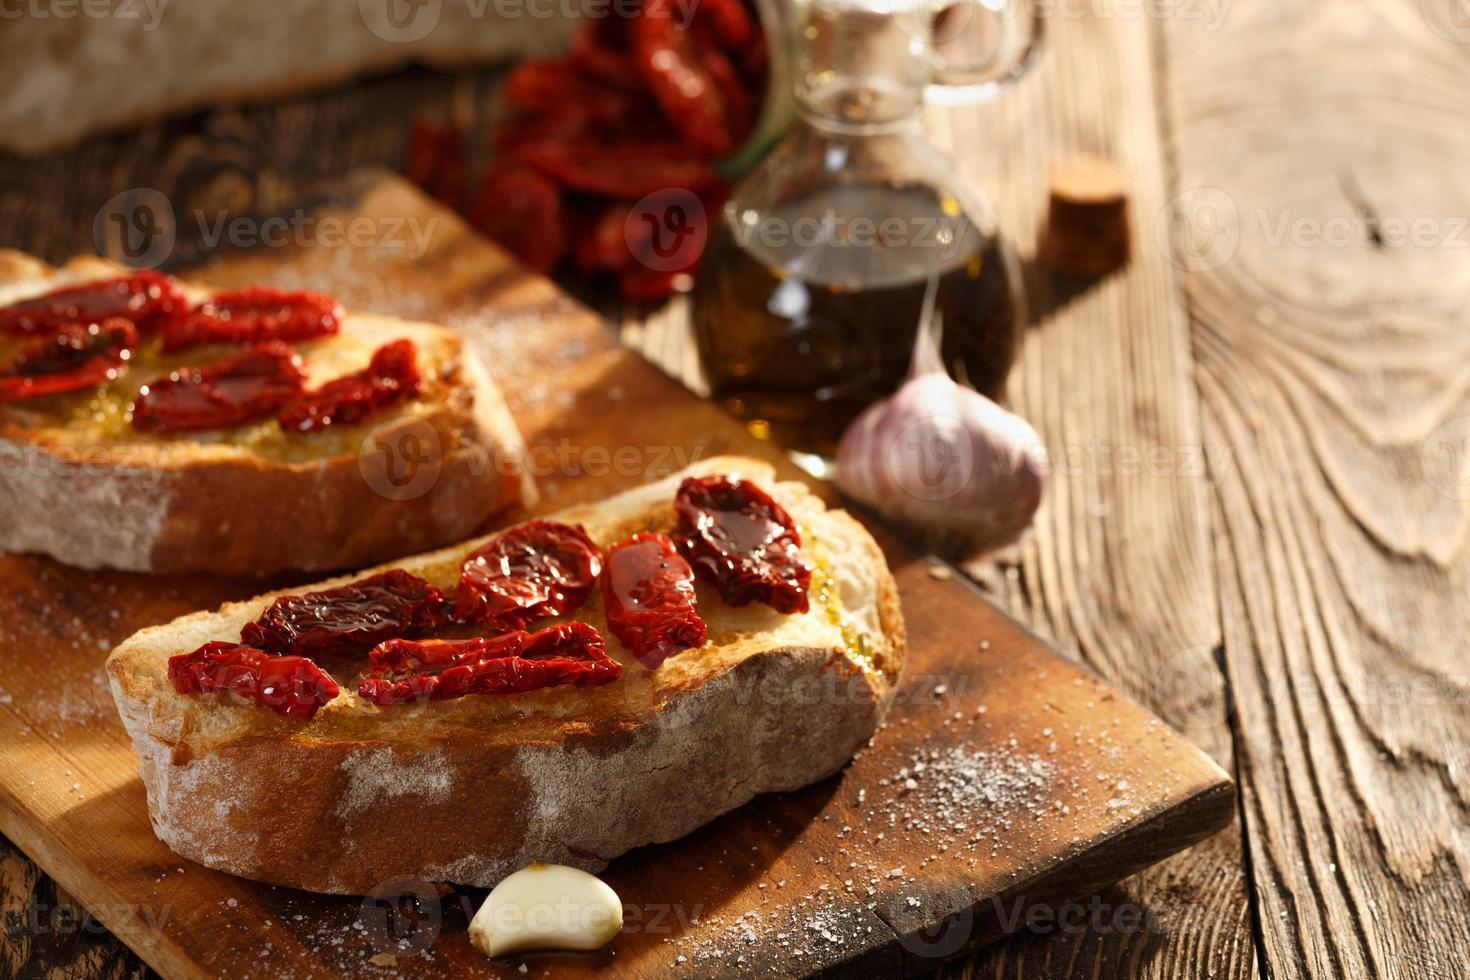 Bruschetta with tomato photo